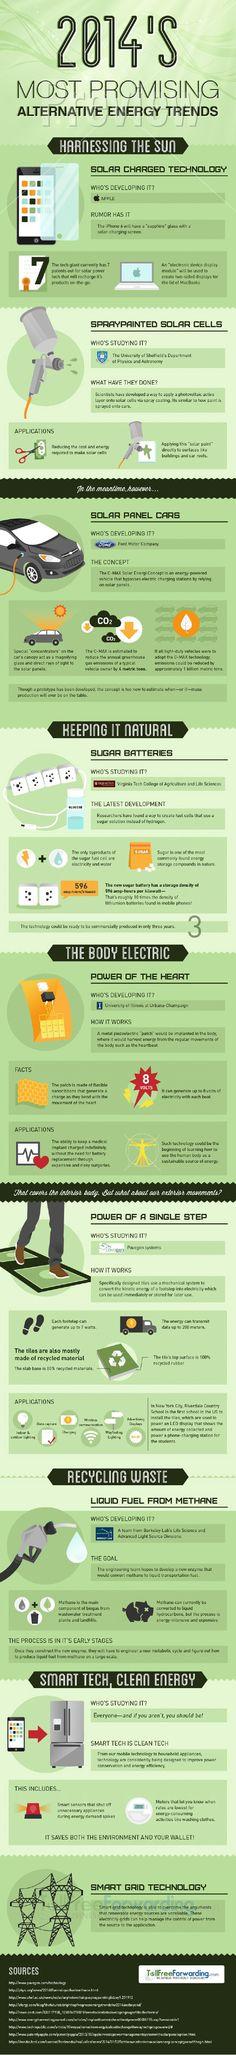 2014 Most Promising Alternative Energy Technology